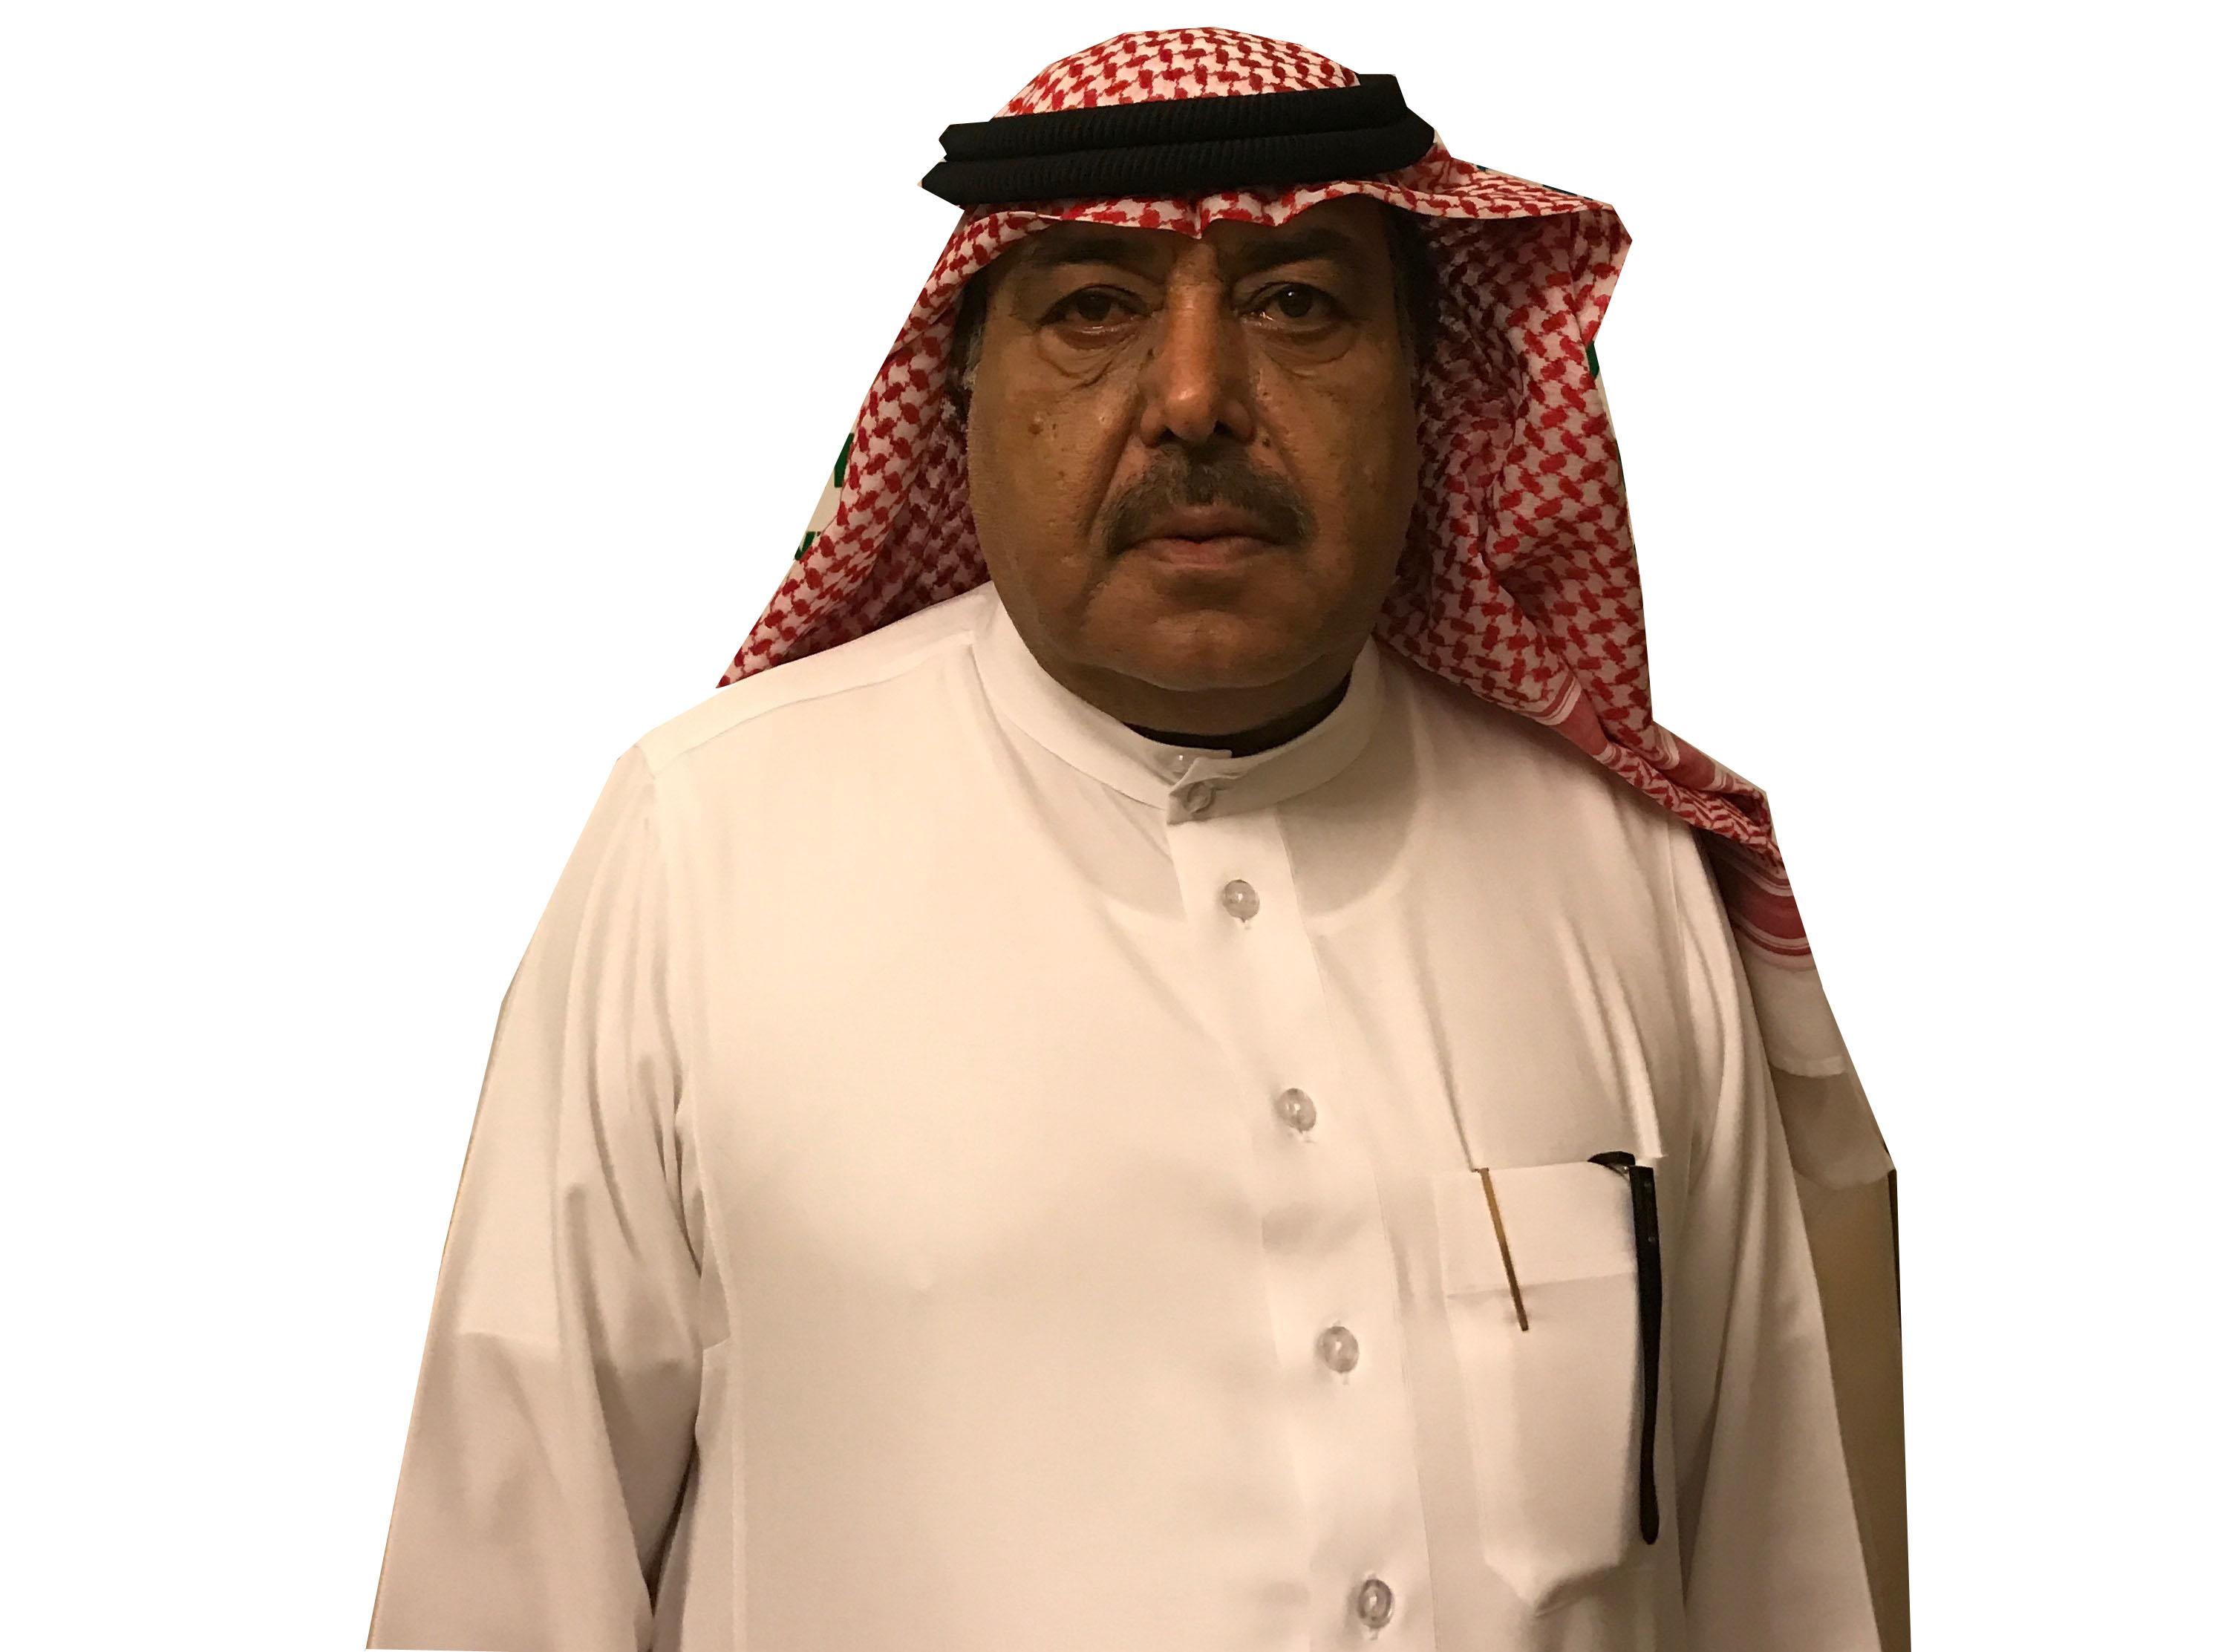 H.E. Sheikh Dr. Mohammed Saleh Al Dhaheri